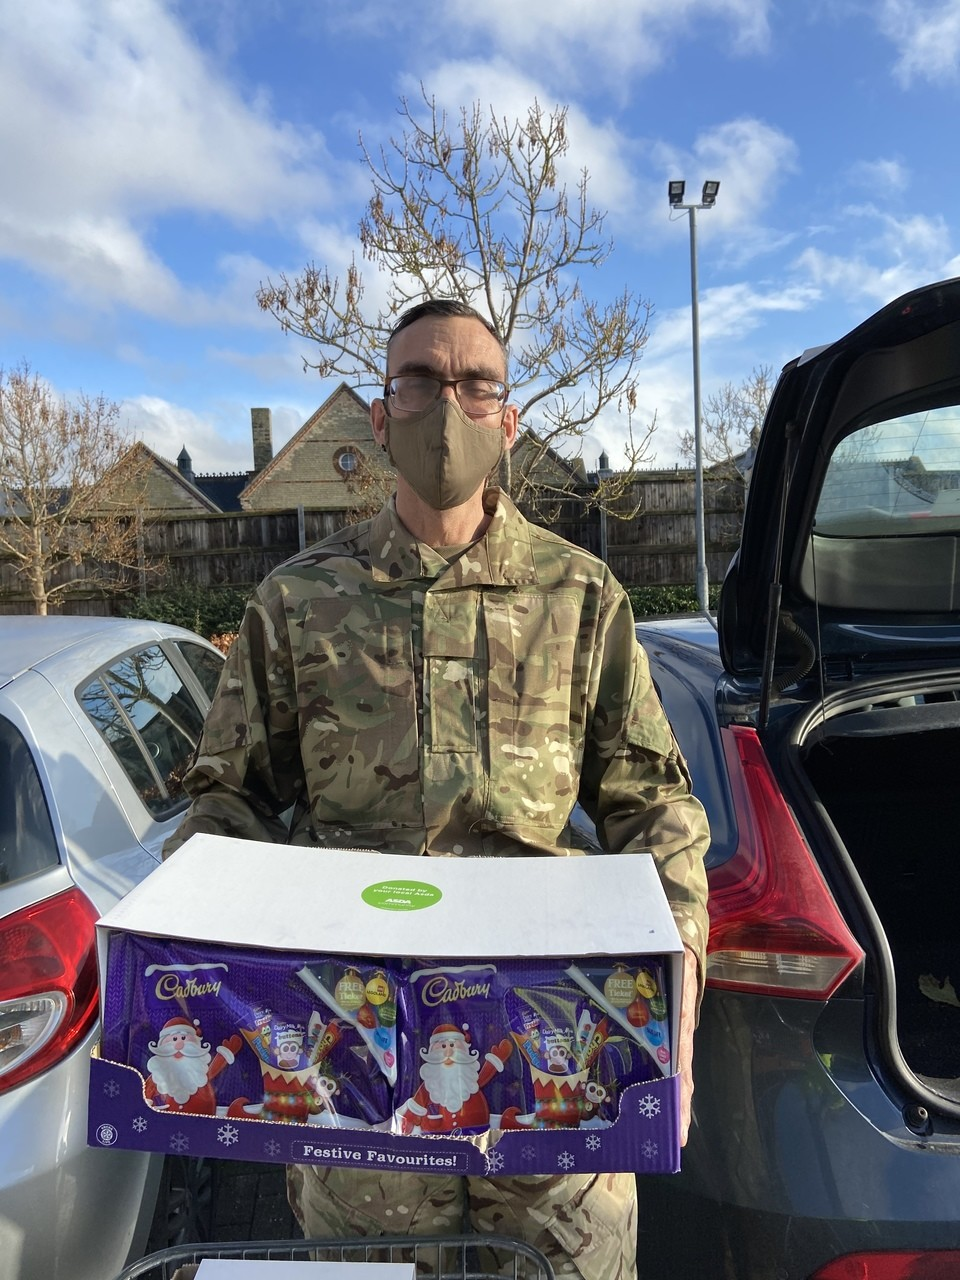 Asda Biggleswade armed forces donation | Asda Biggleswade